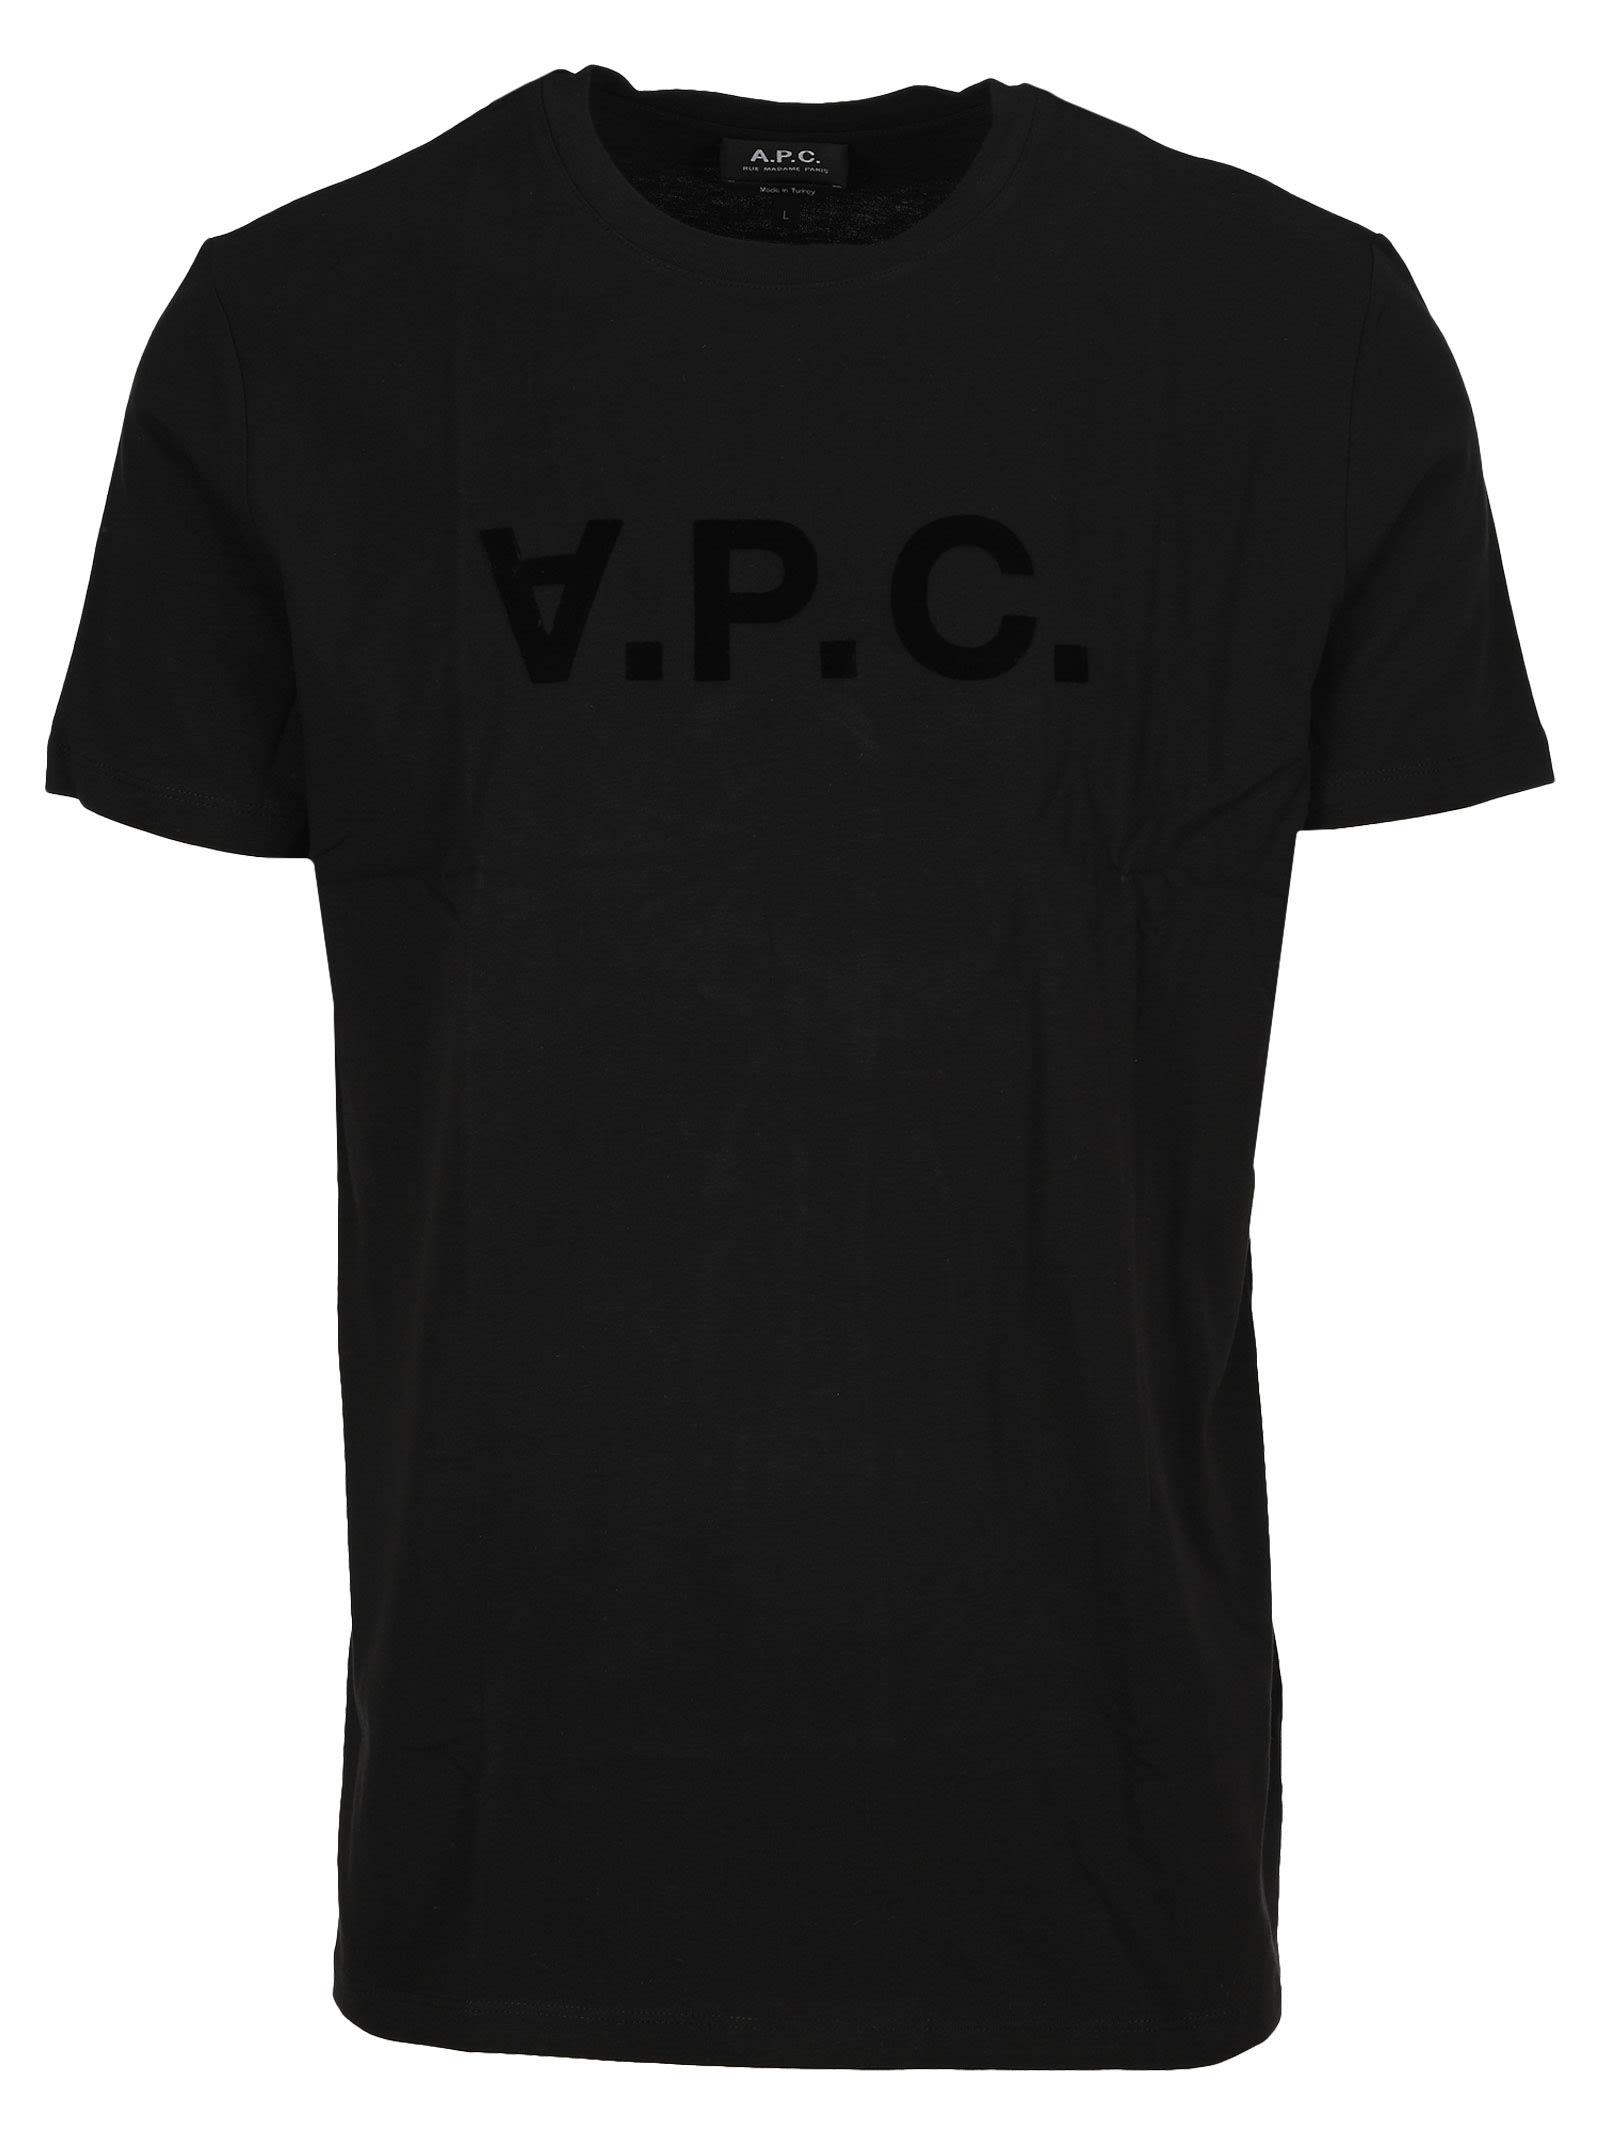 A.P.C. A.P.C. VPC T-SHIRT